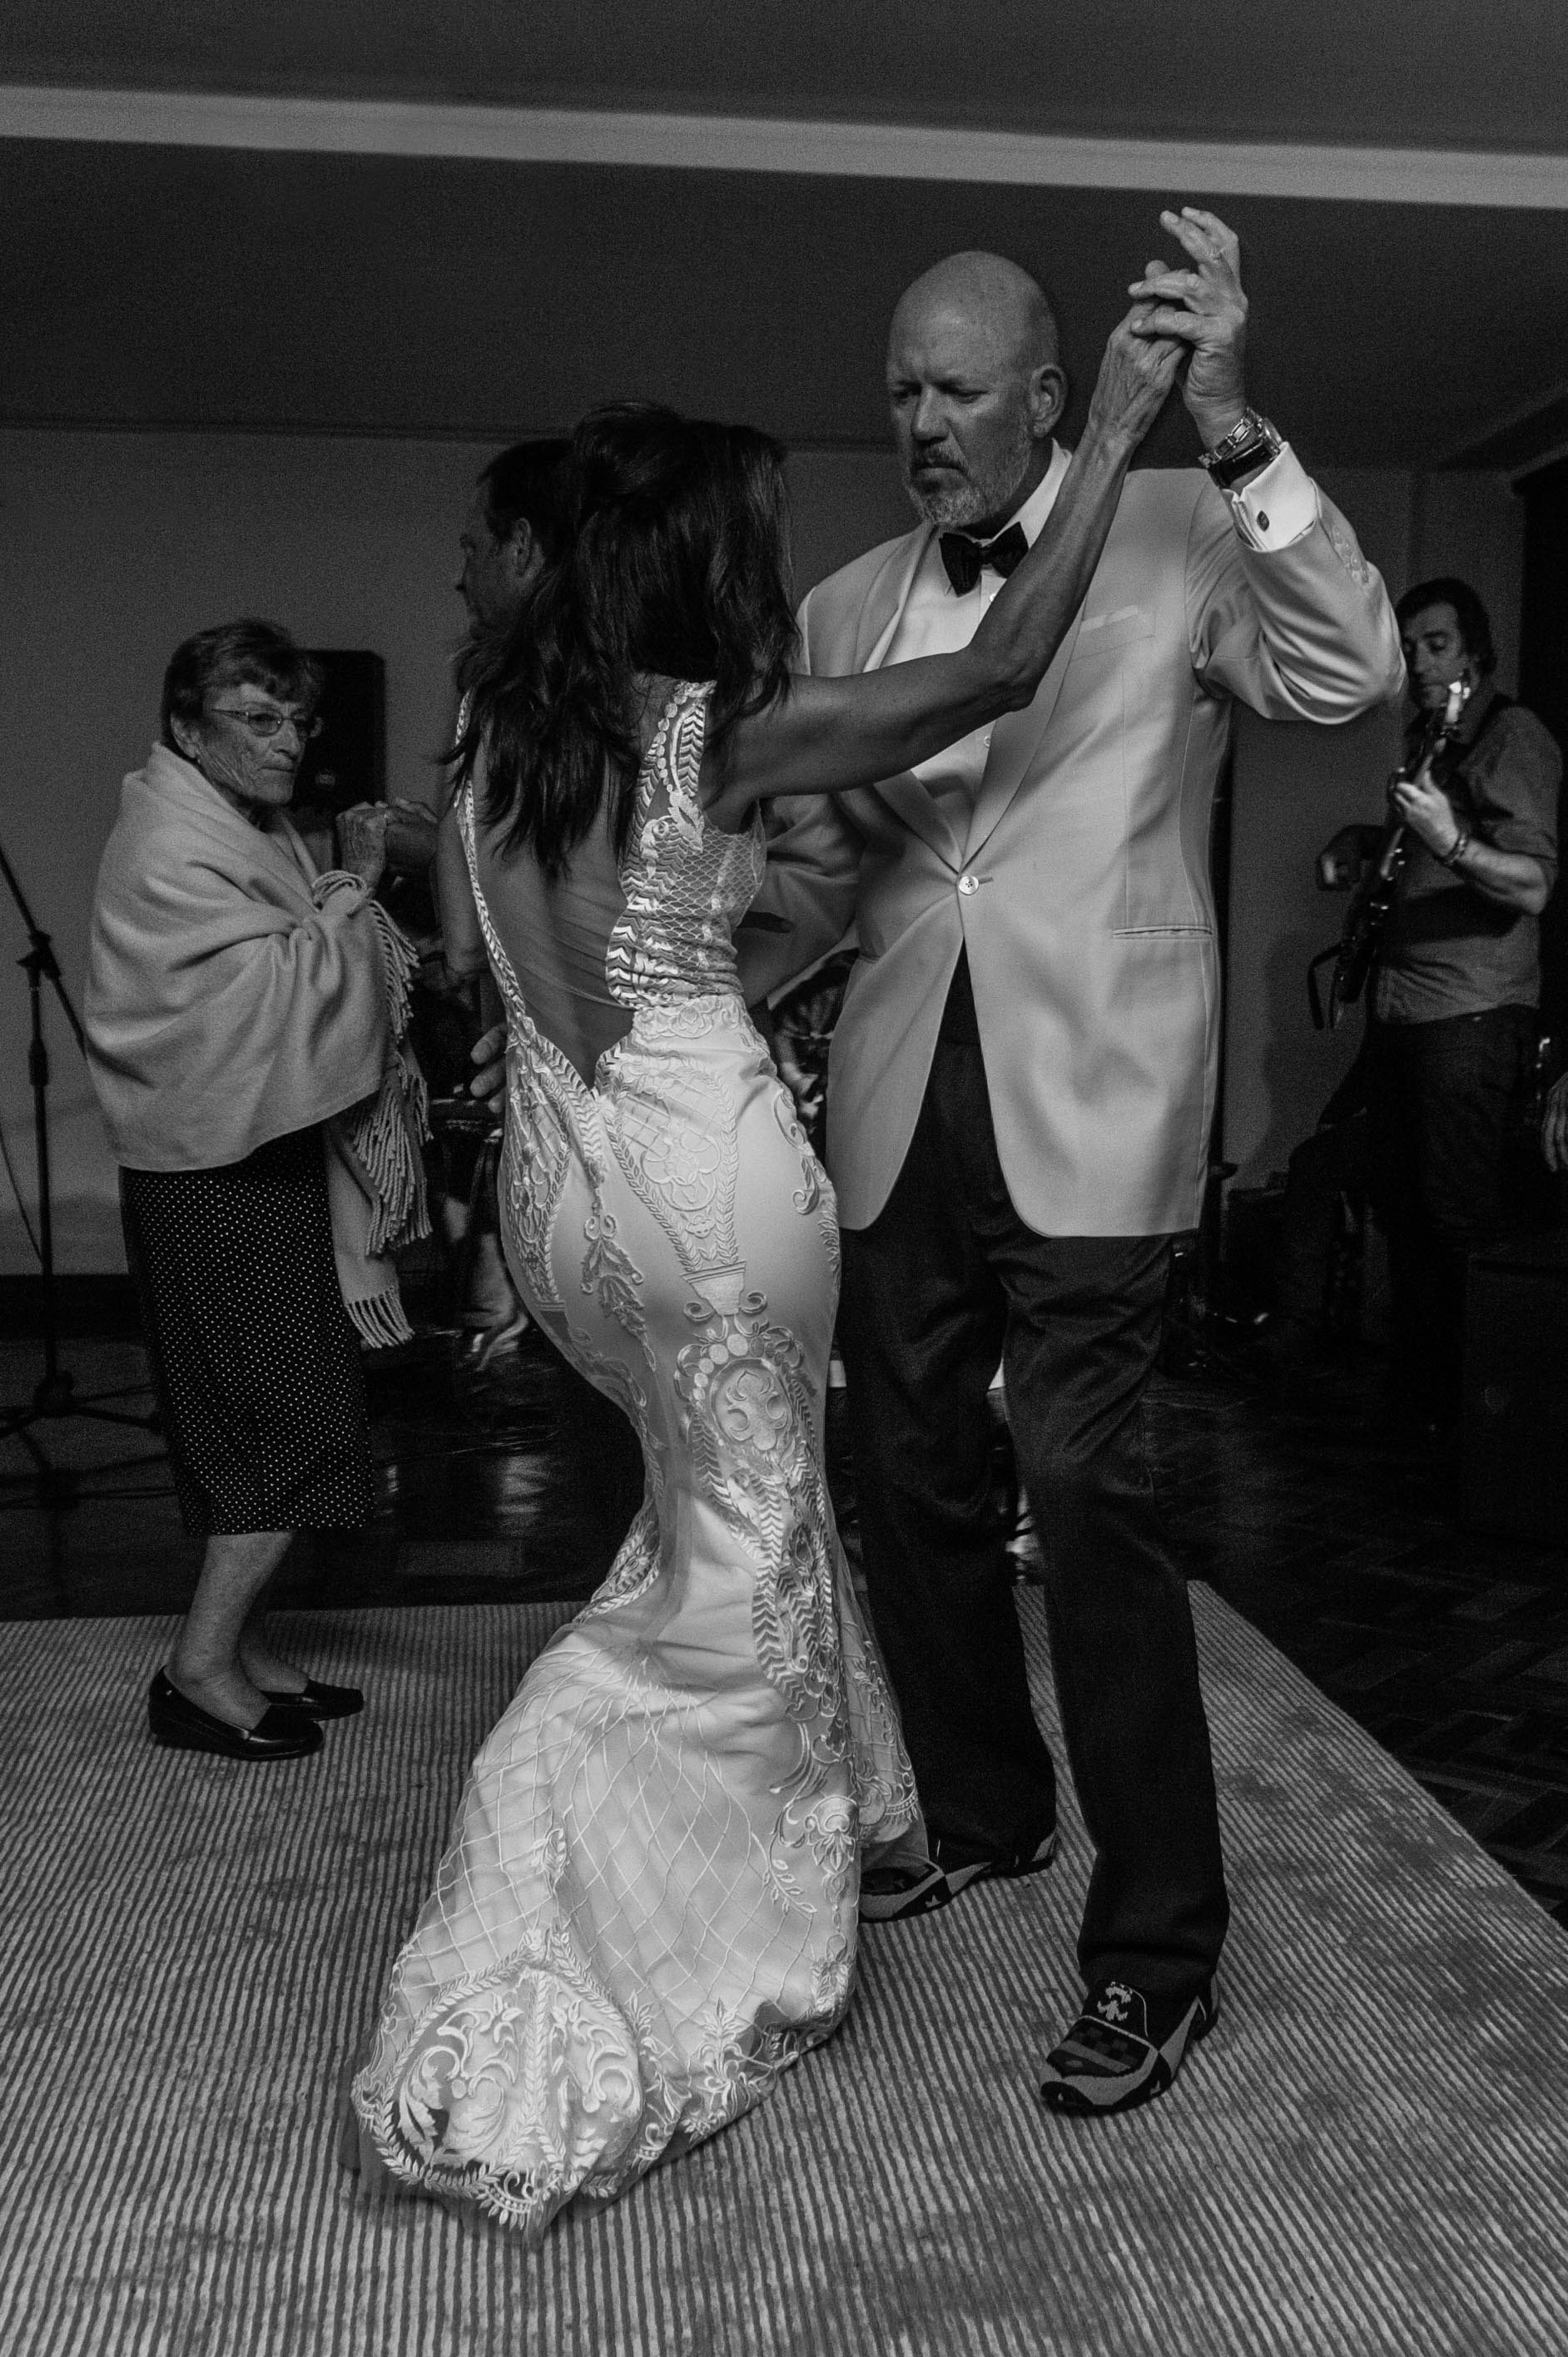 John-henry-wedding-photo-bridal-001.JPG